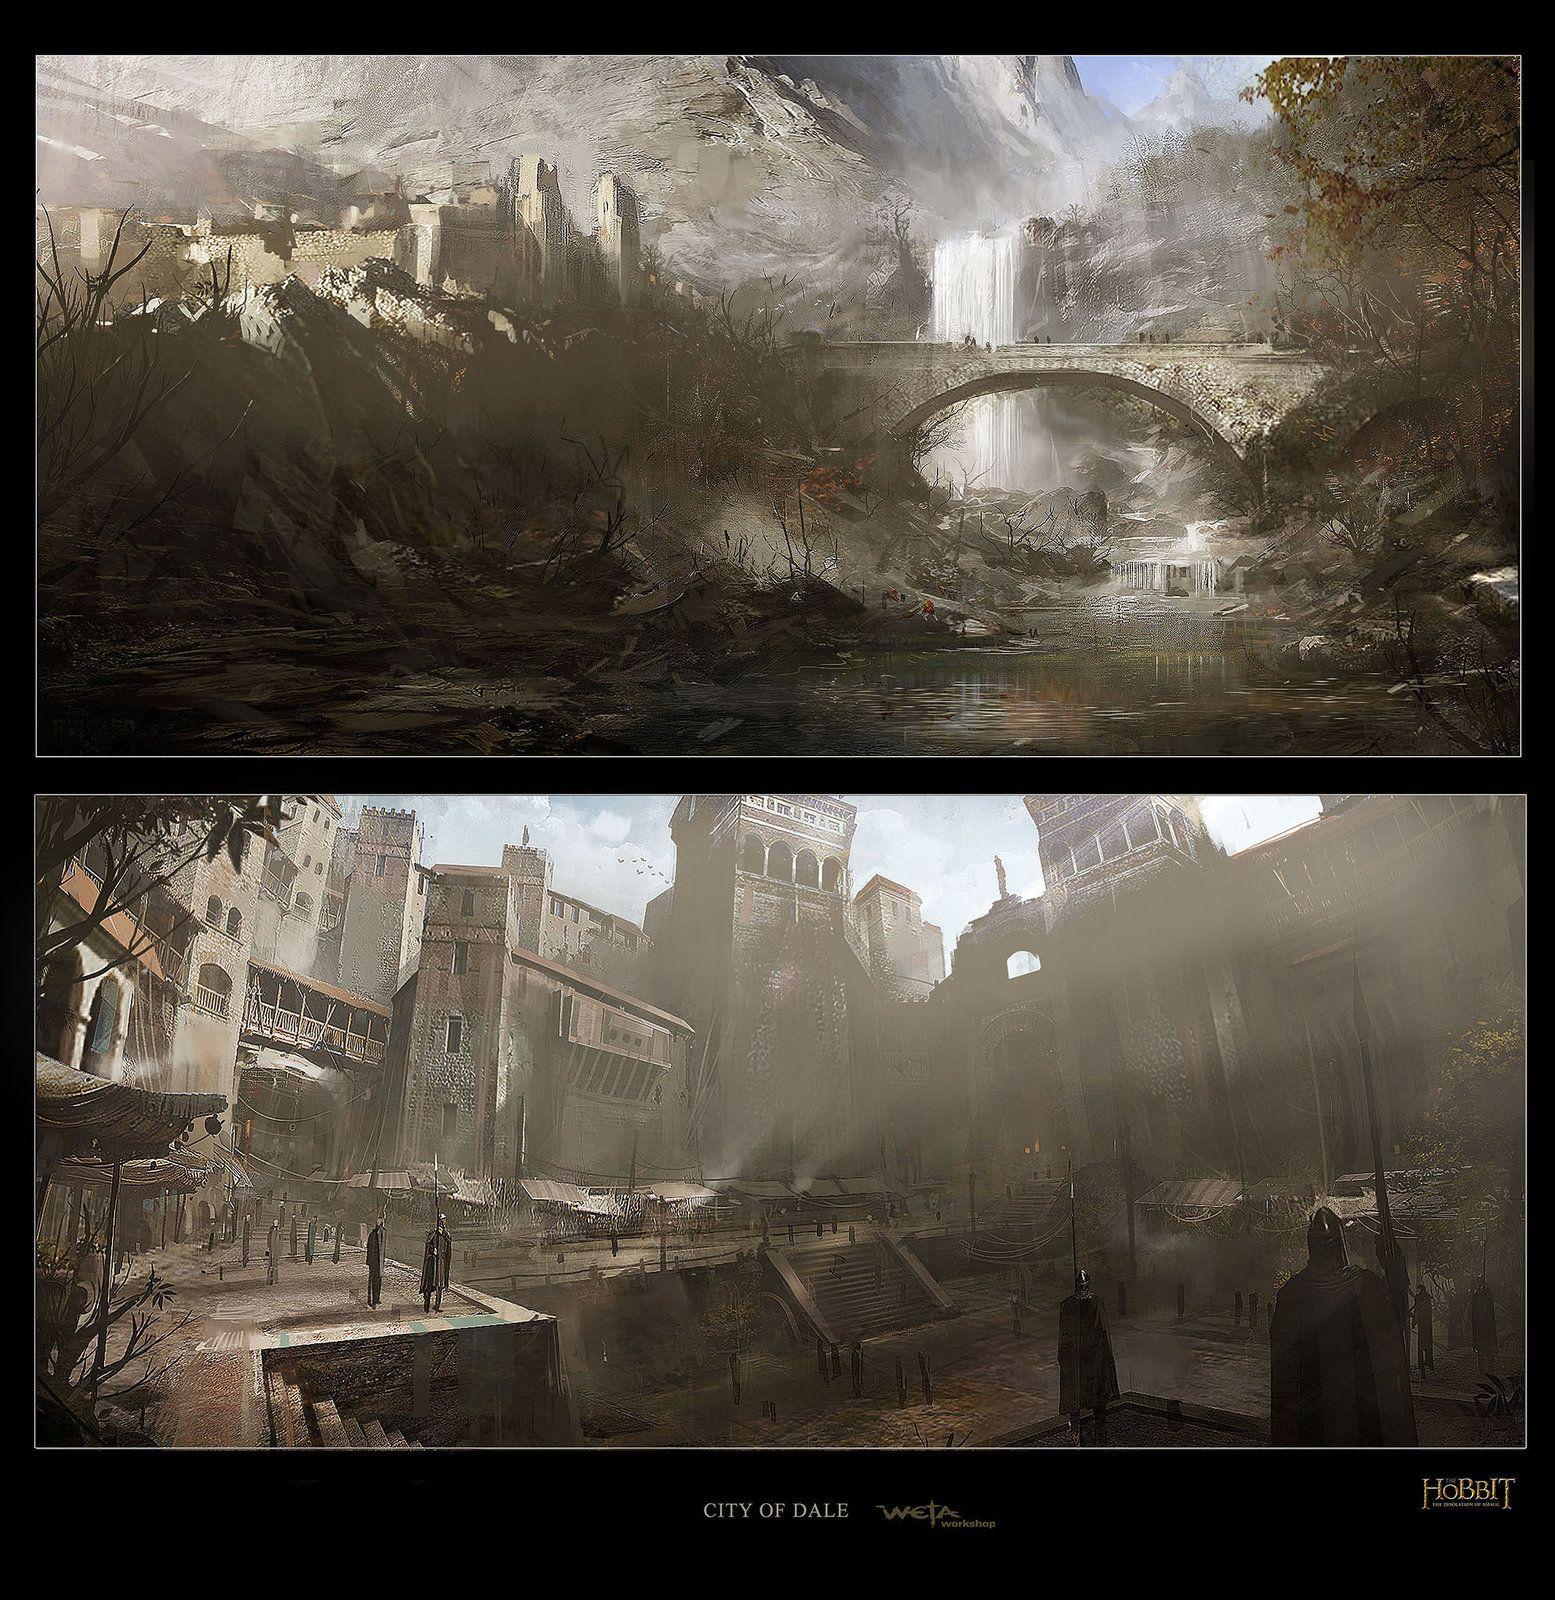 Tomb Rider Wallpaper: Pin By Pascalis Sadewa On Sci-Fi Scenes